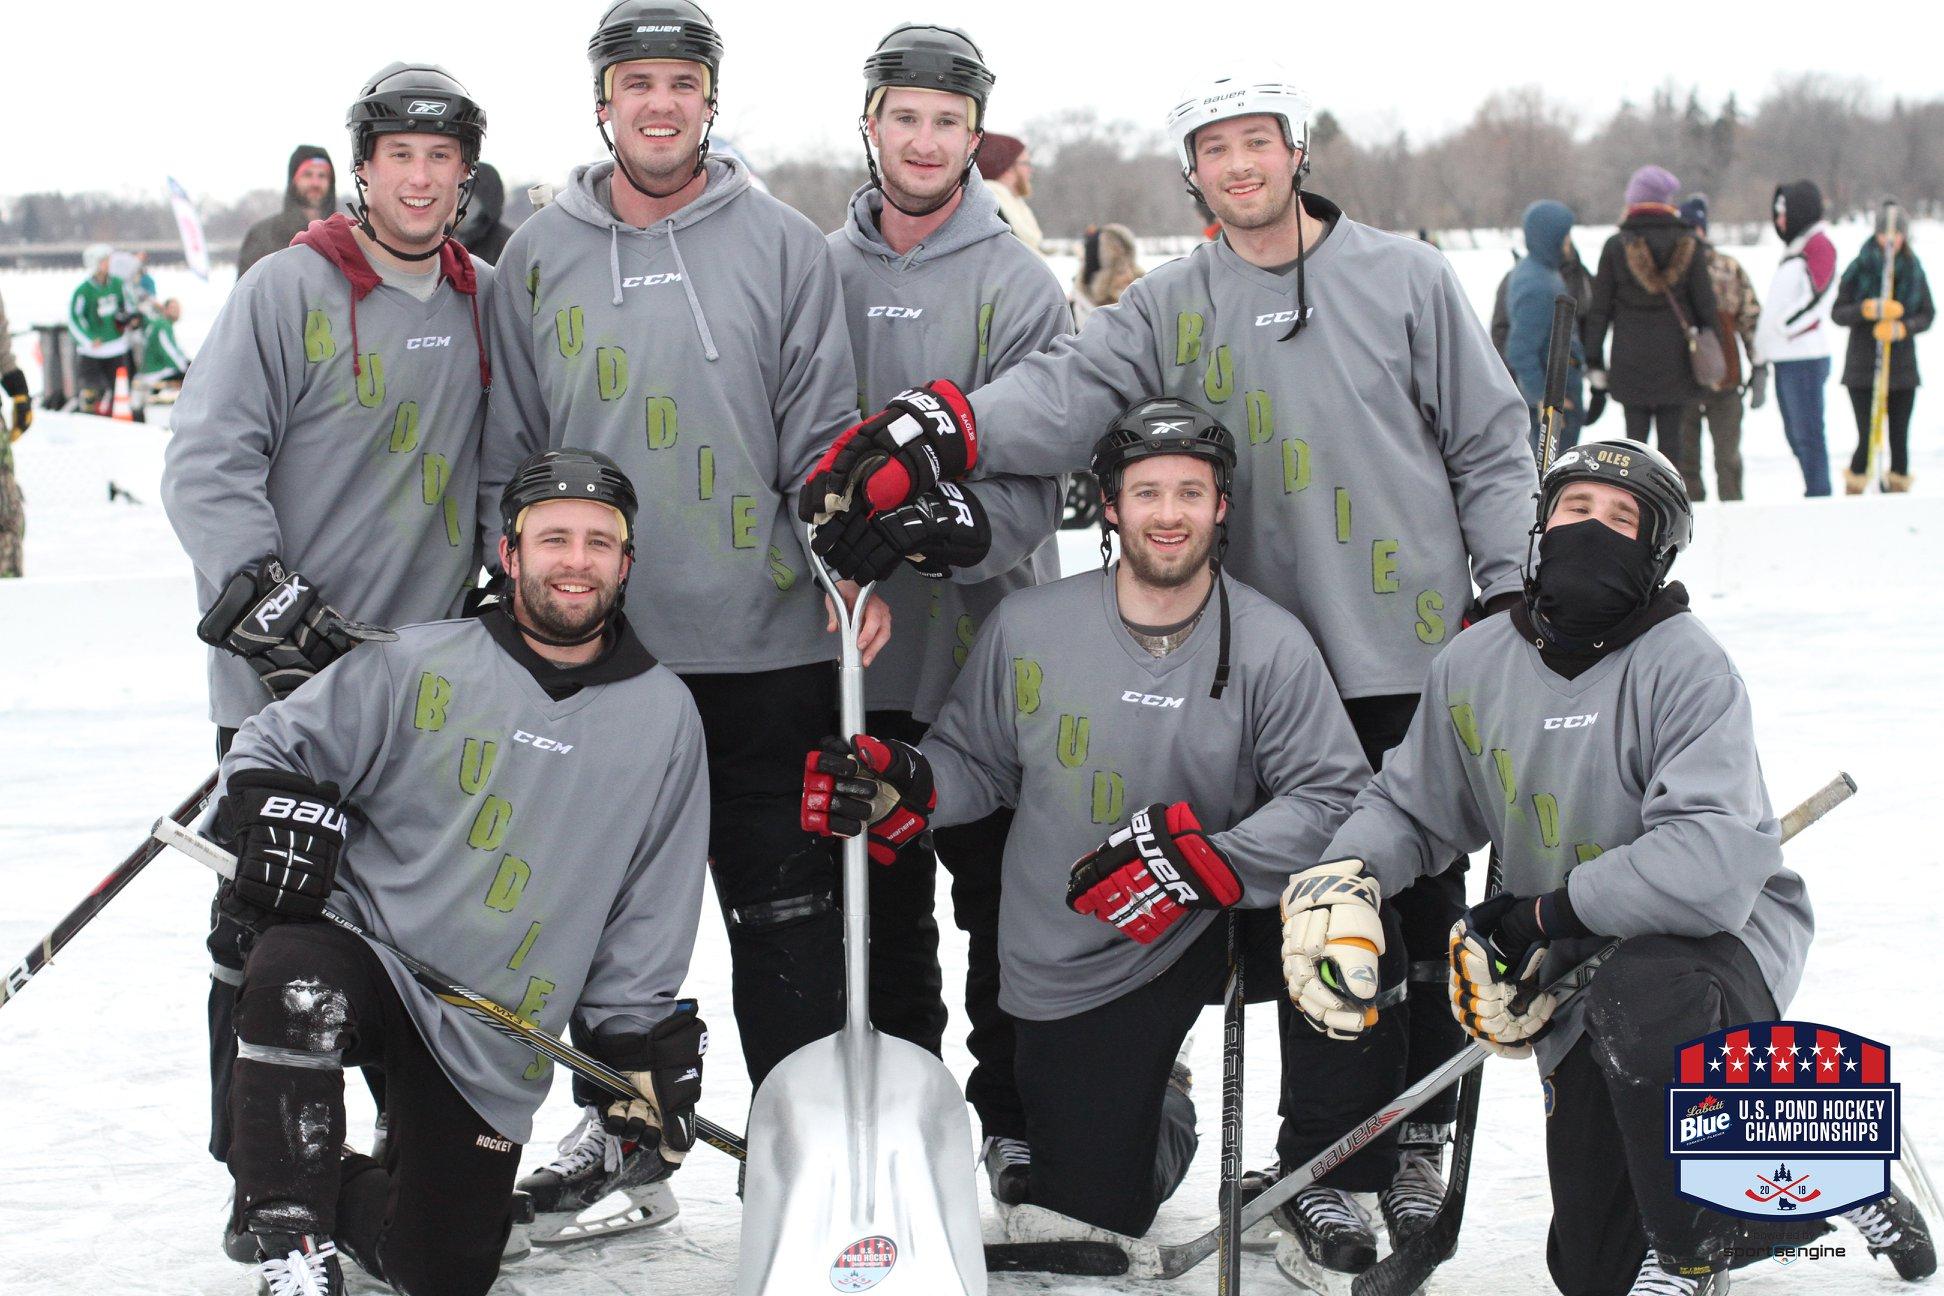 USPHC Cedar Champions: Boozy Buddies